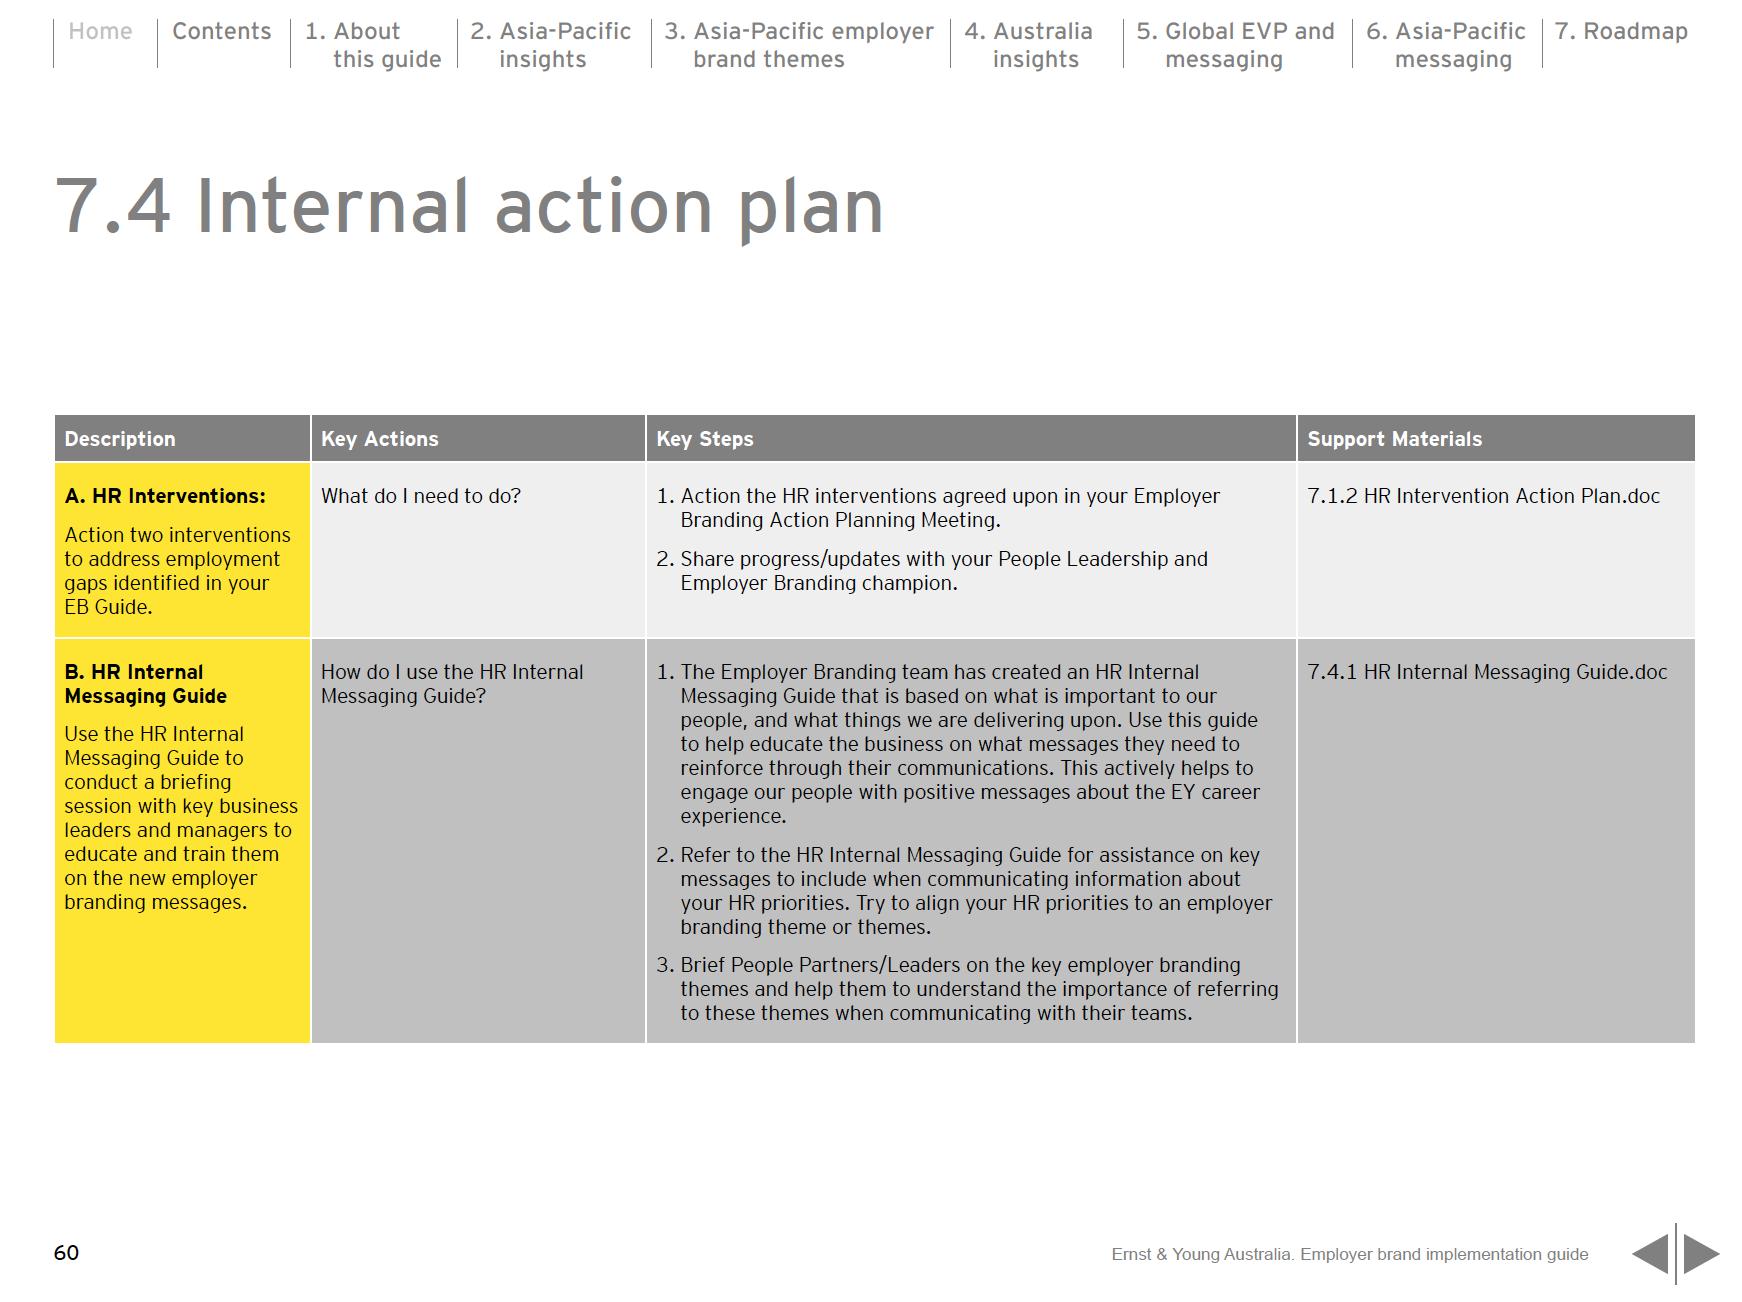 EY_Internal Action Plan.png